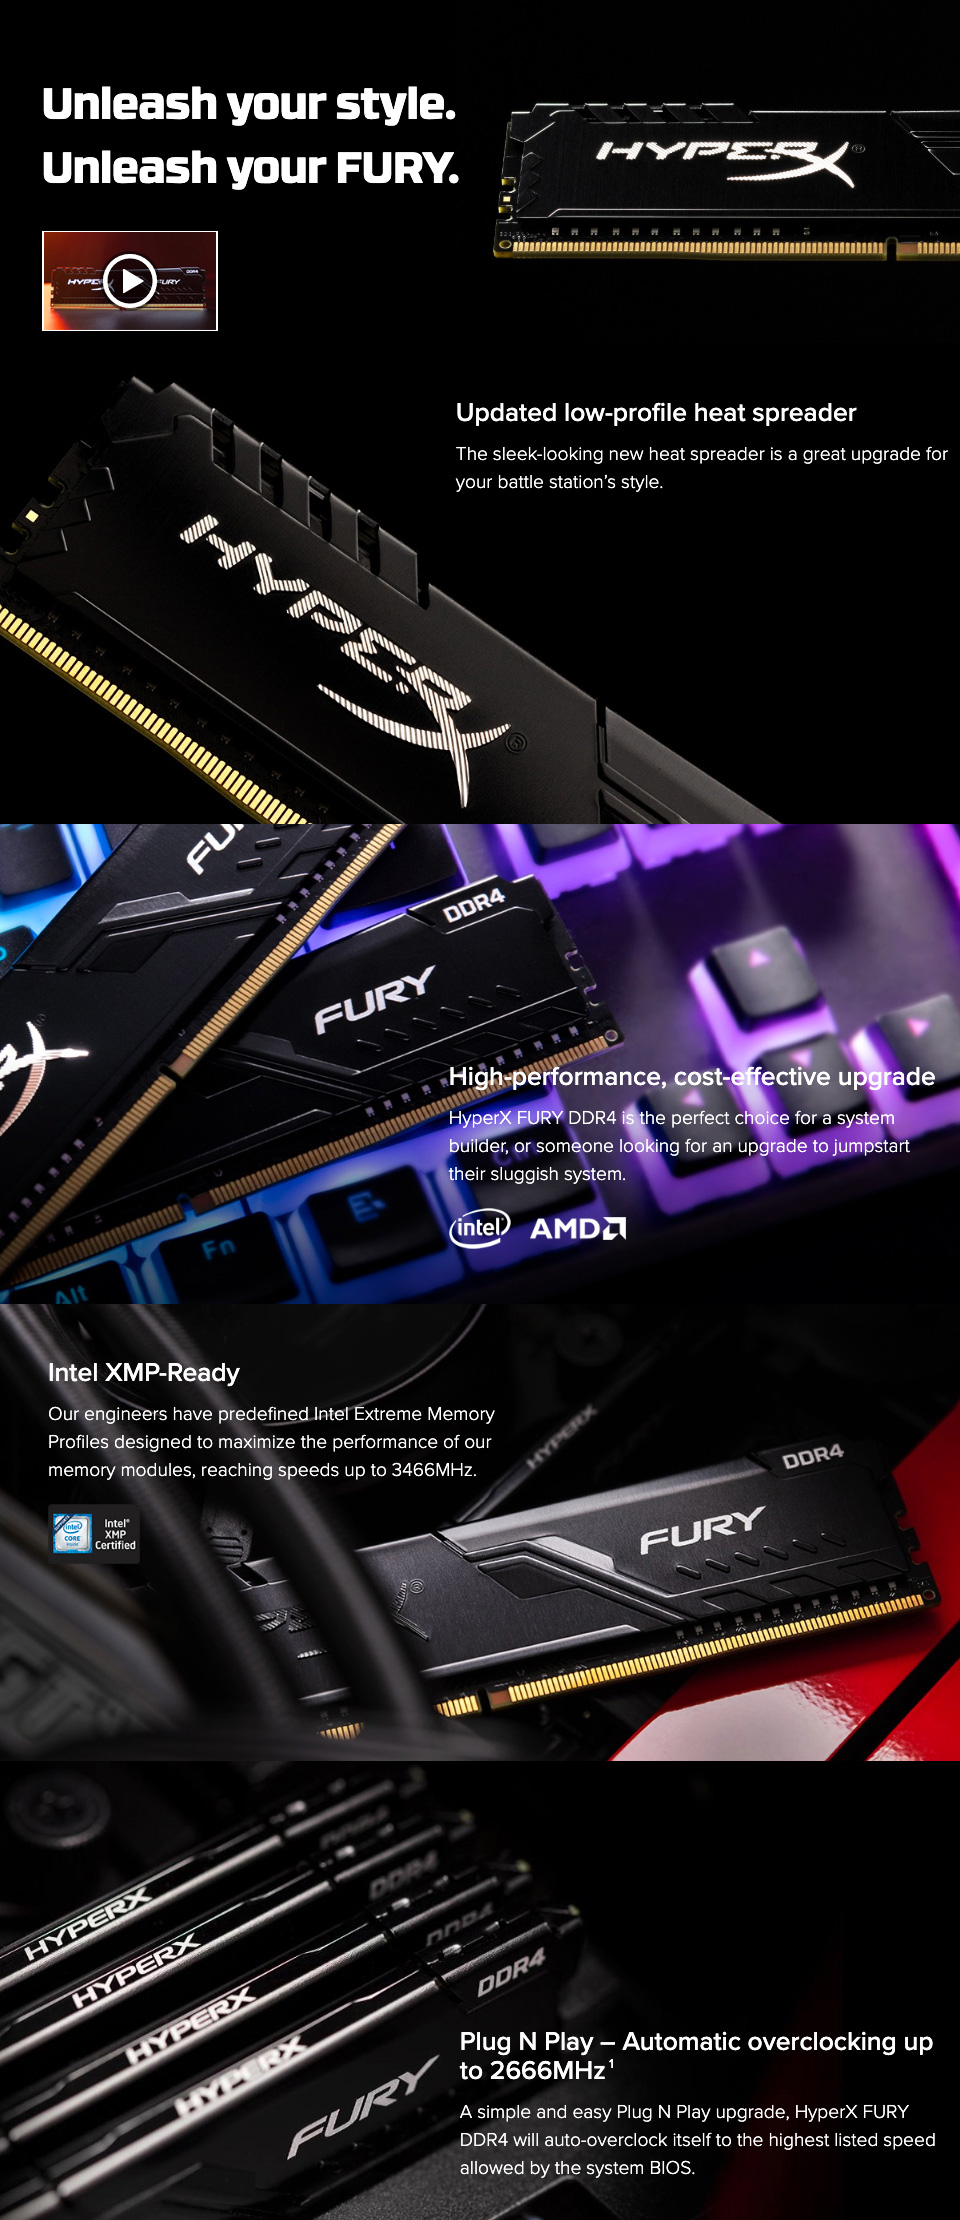 Kingston HyperX Fury HX424C15FB3K2/8 8GB (2x4GB) DDR4 Black features